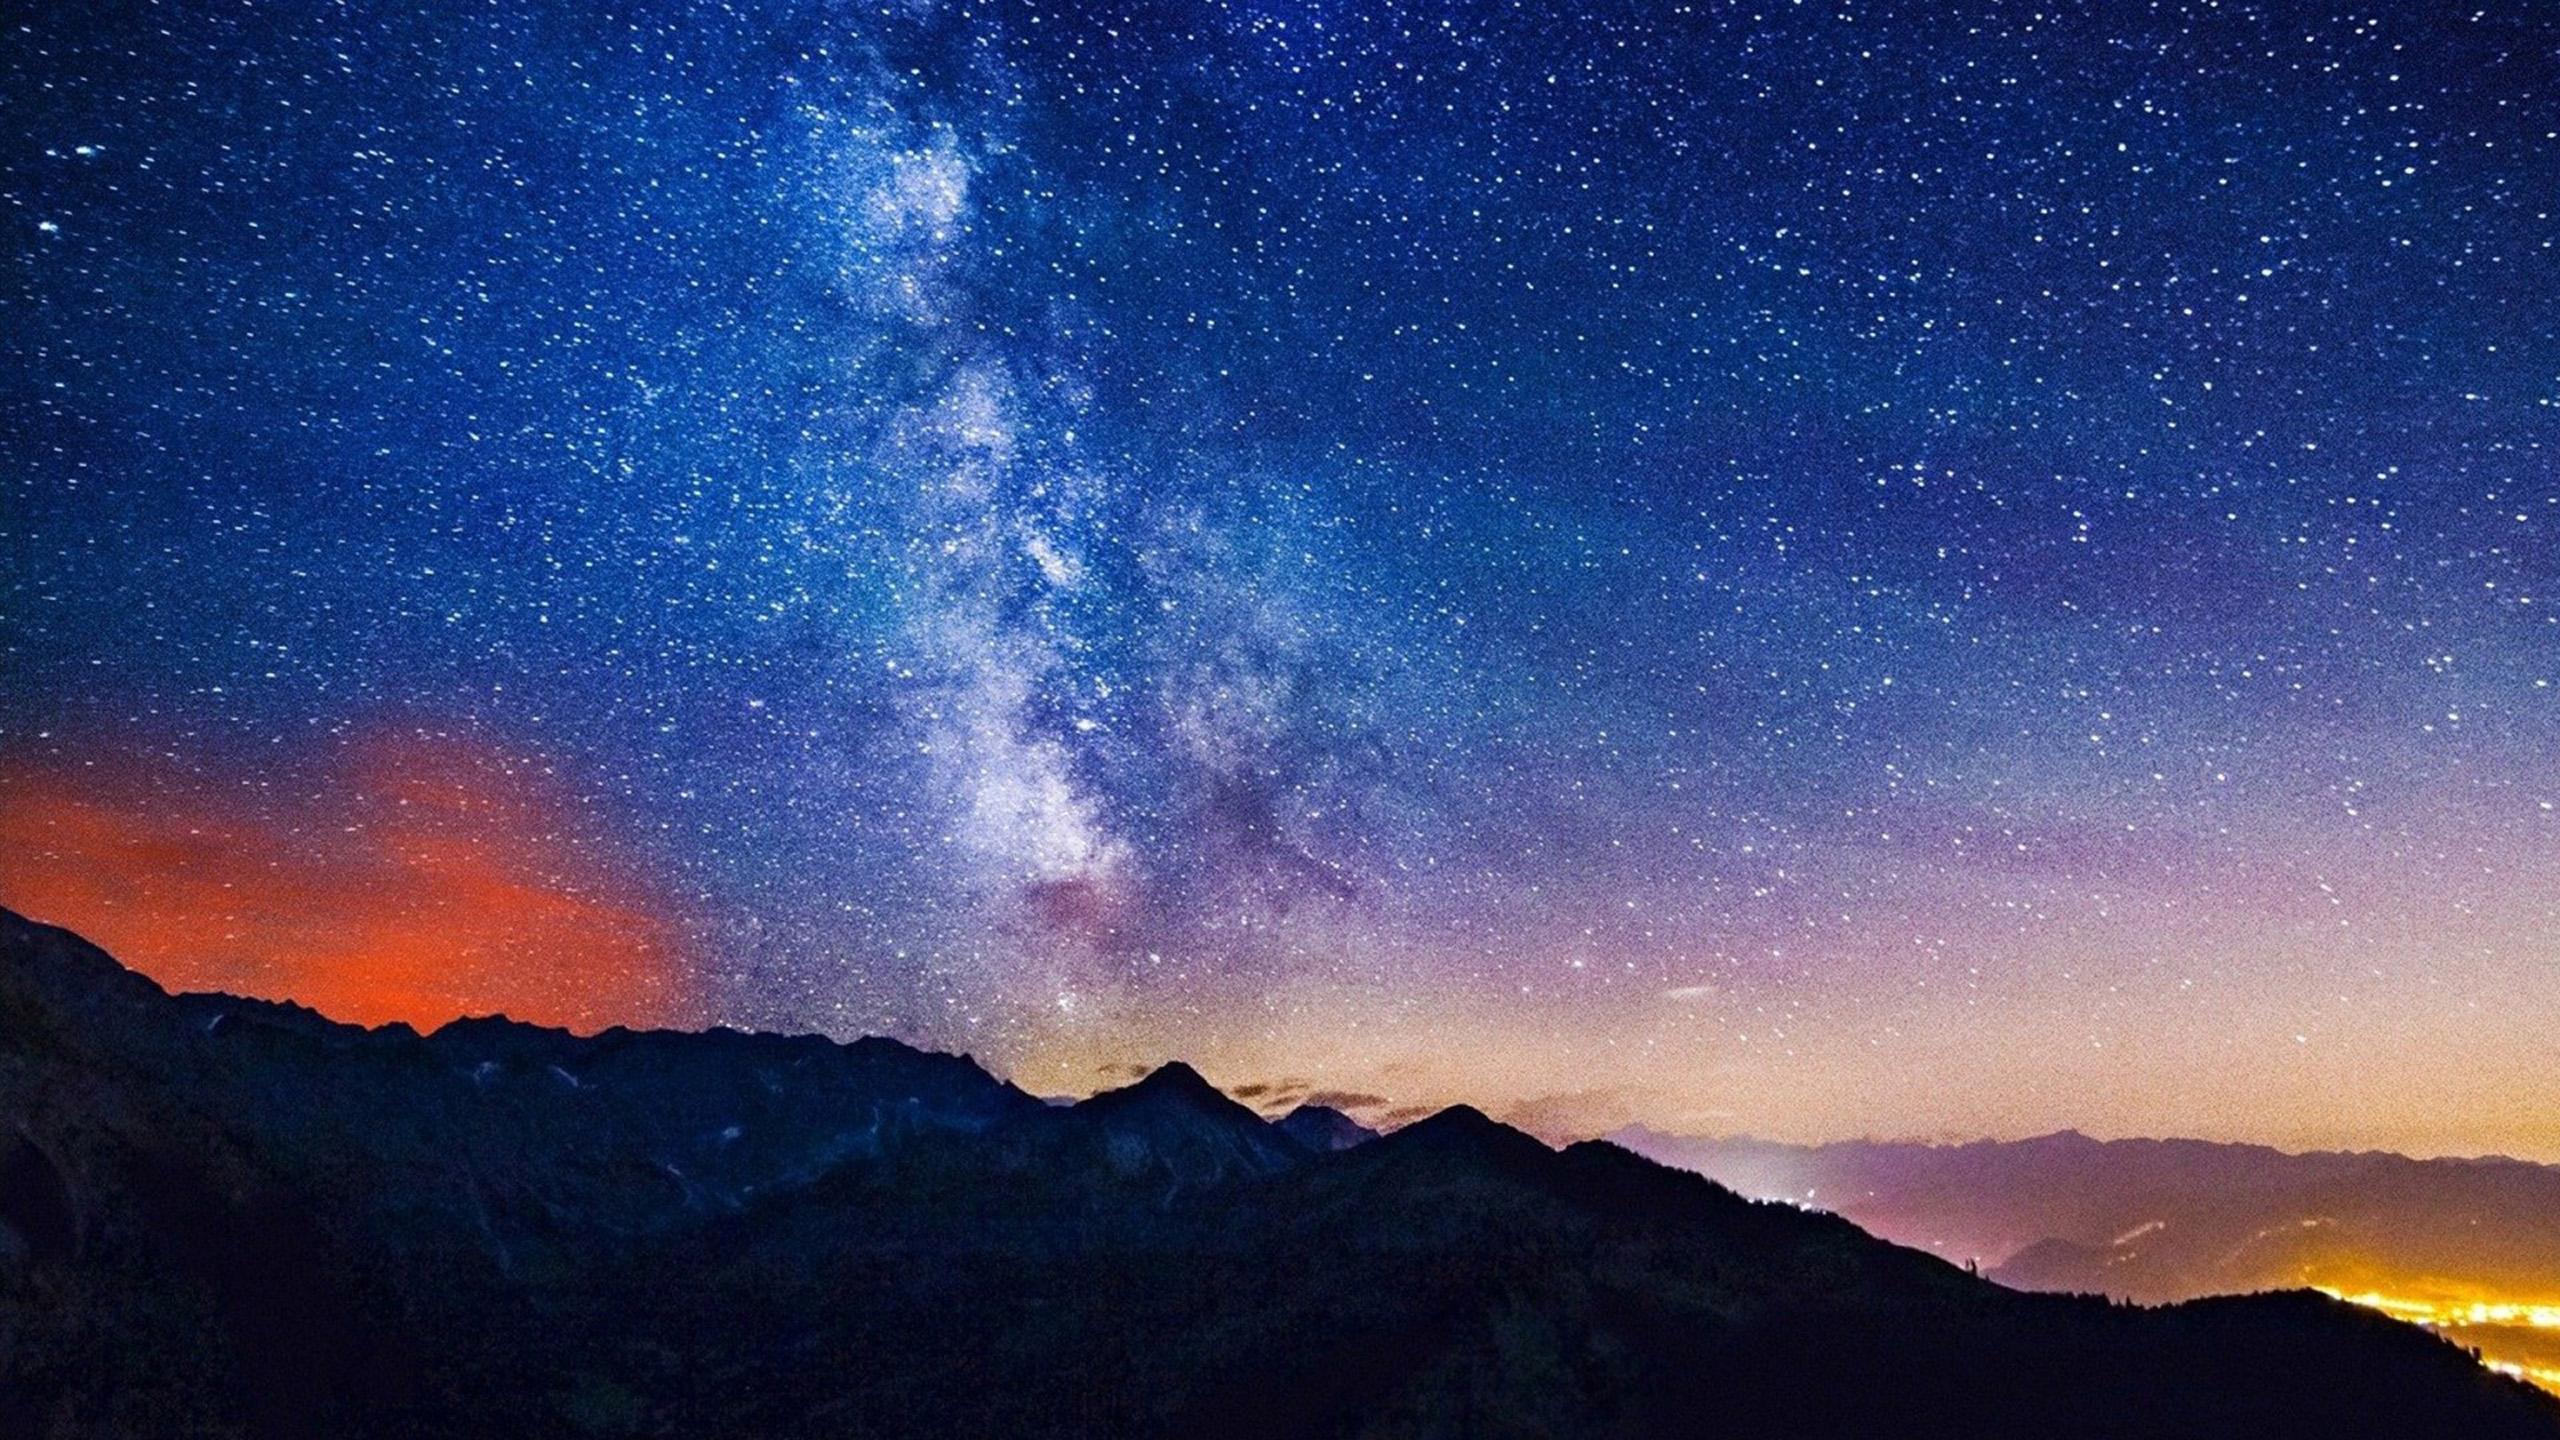 Starry night sky Wallpapers HD HD Desktop Wallpapers 2560x1440